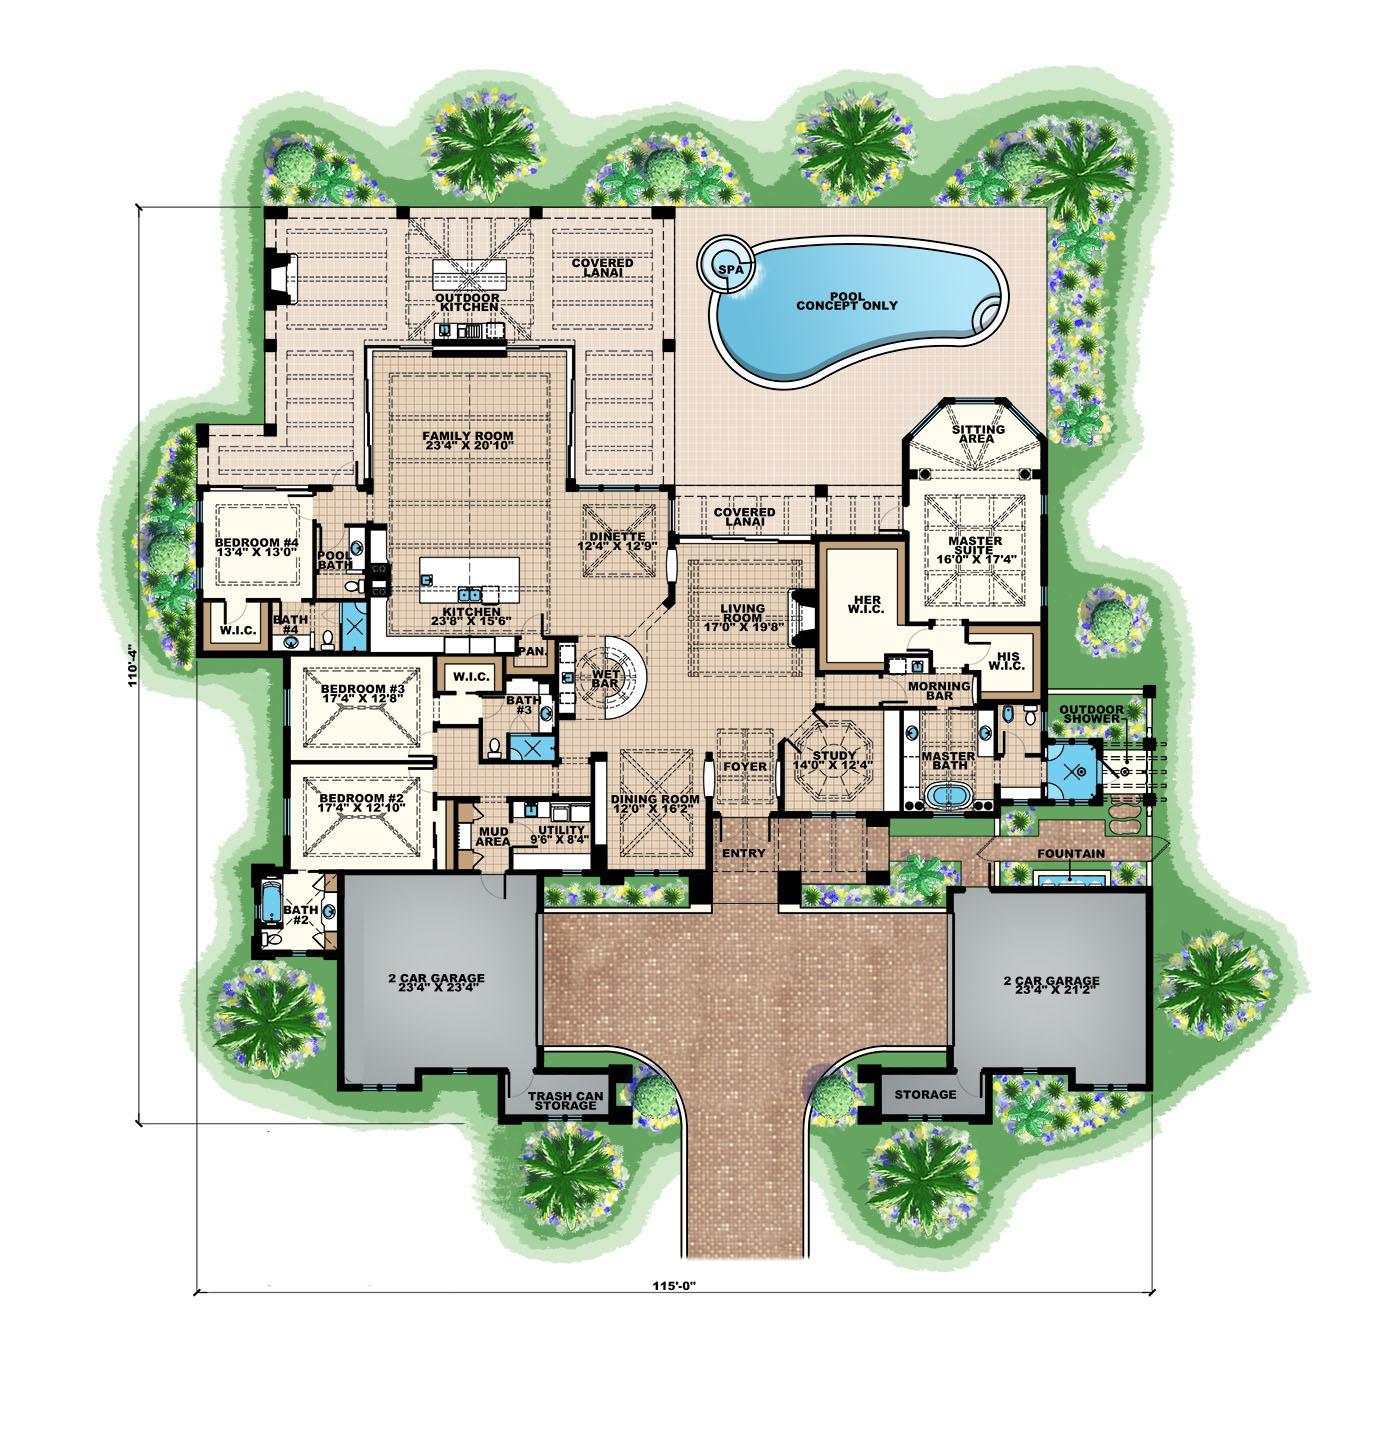 Florida Style House Plan 175 1131 4 Bedrm 4817 Sq Ft